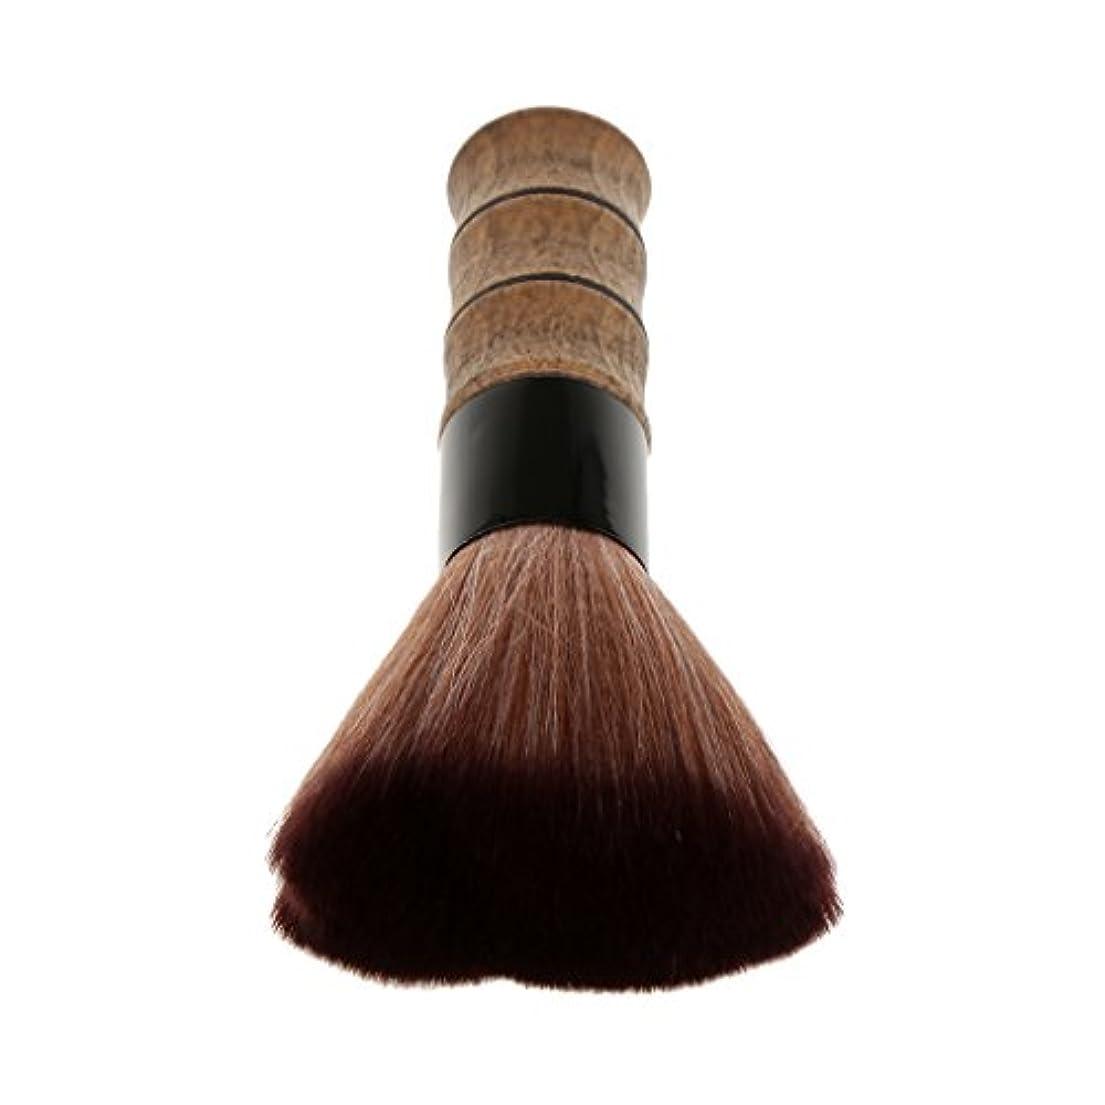 Perfk シェービングブラシ 洗顔 美容ブラシ メイクブラシ ソフトファイバー 竹ハンドル シェービング ブラシ スキンケア メイクアップ 2色選べる - 褐色